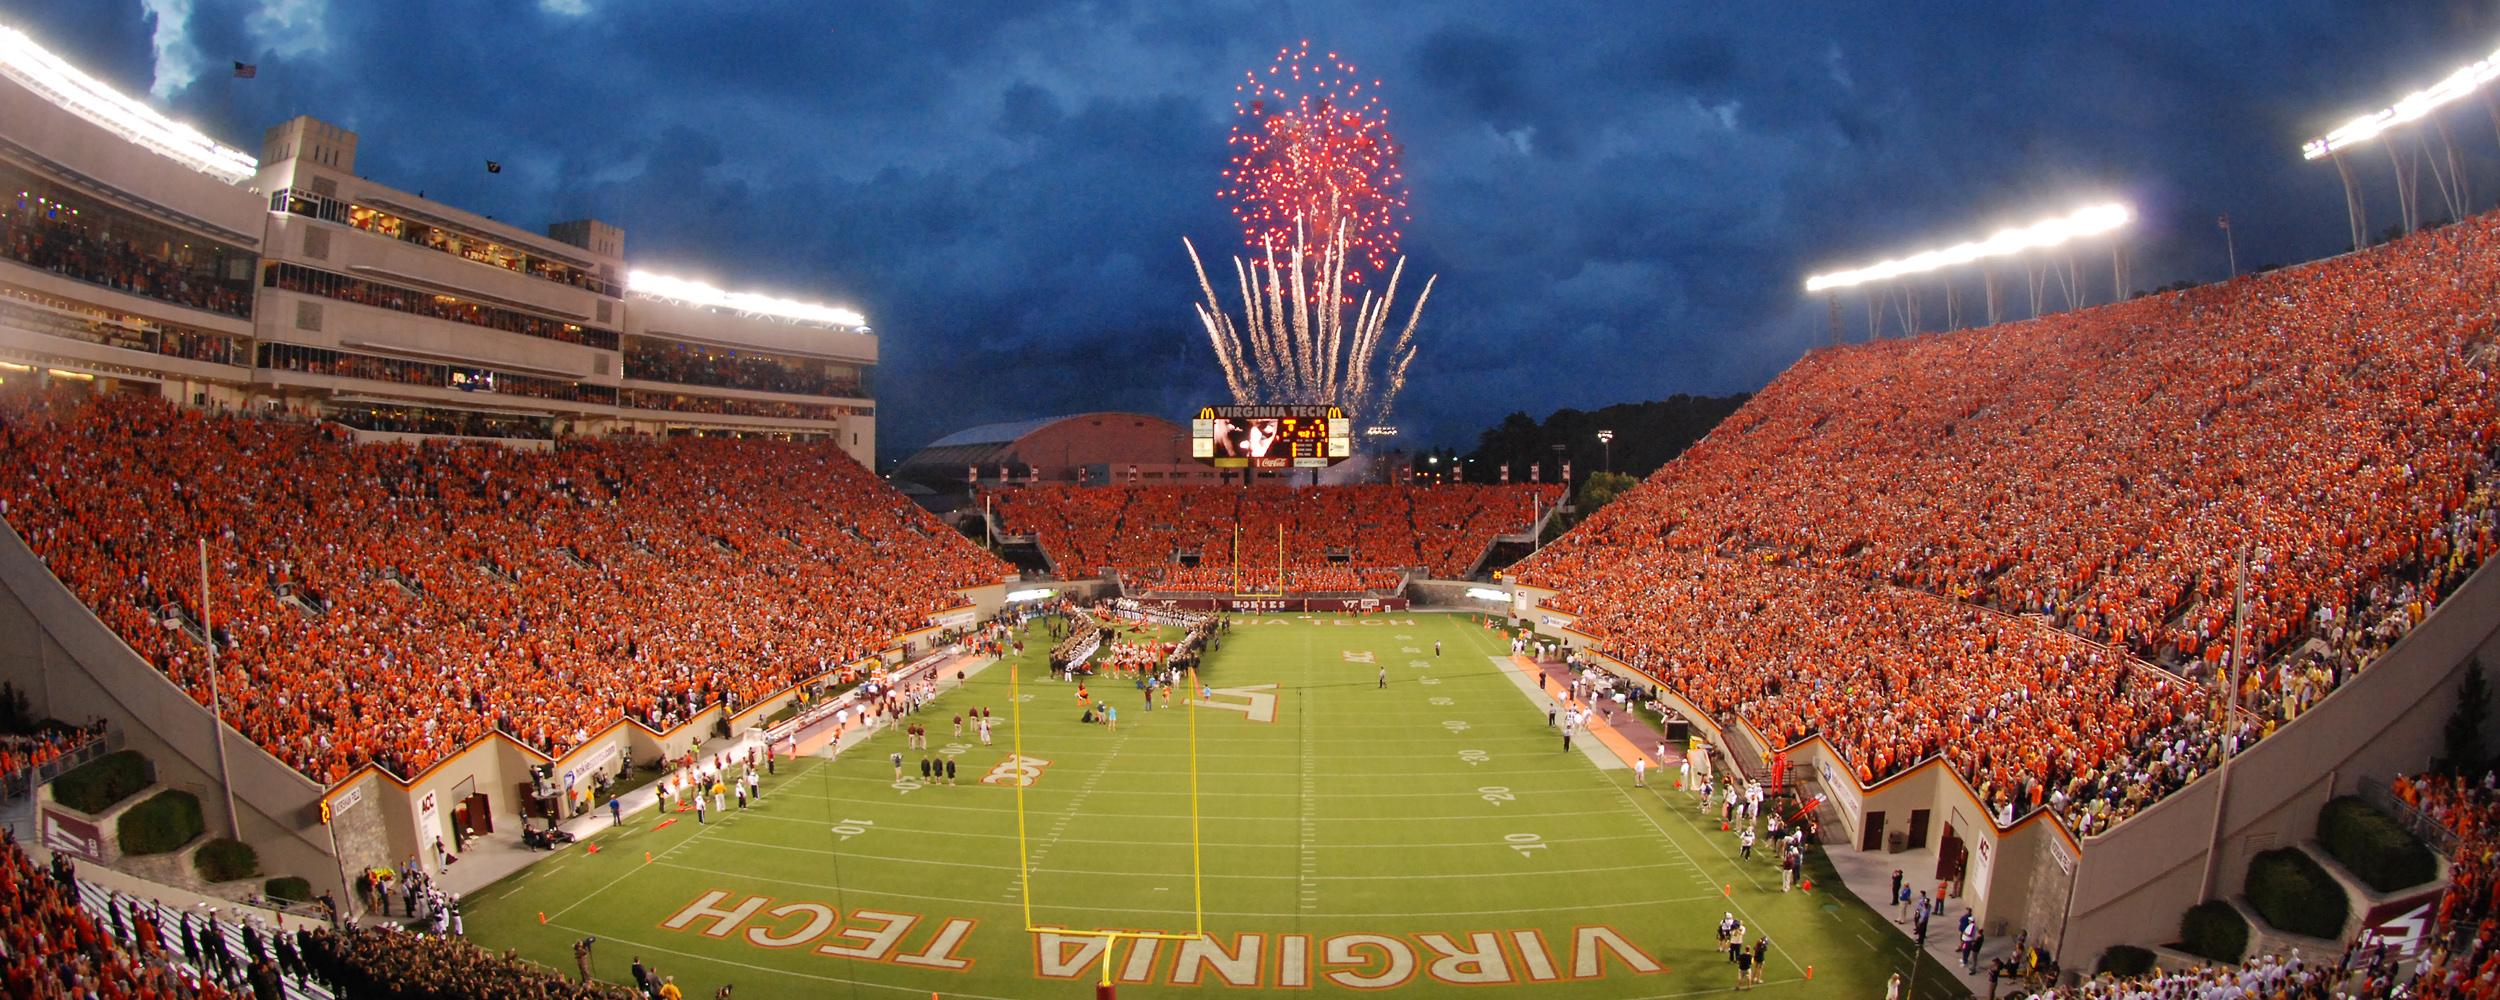 Virginia Tech Lane Stadium